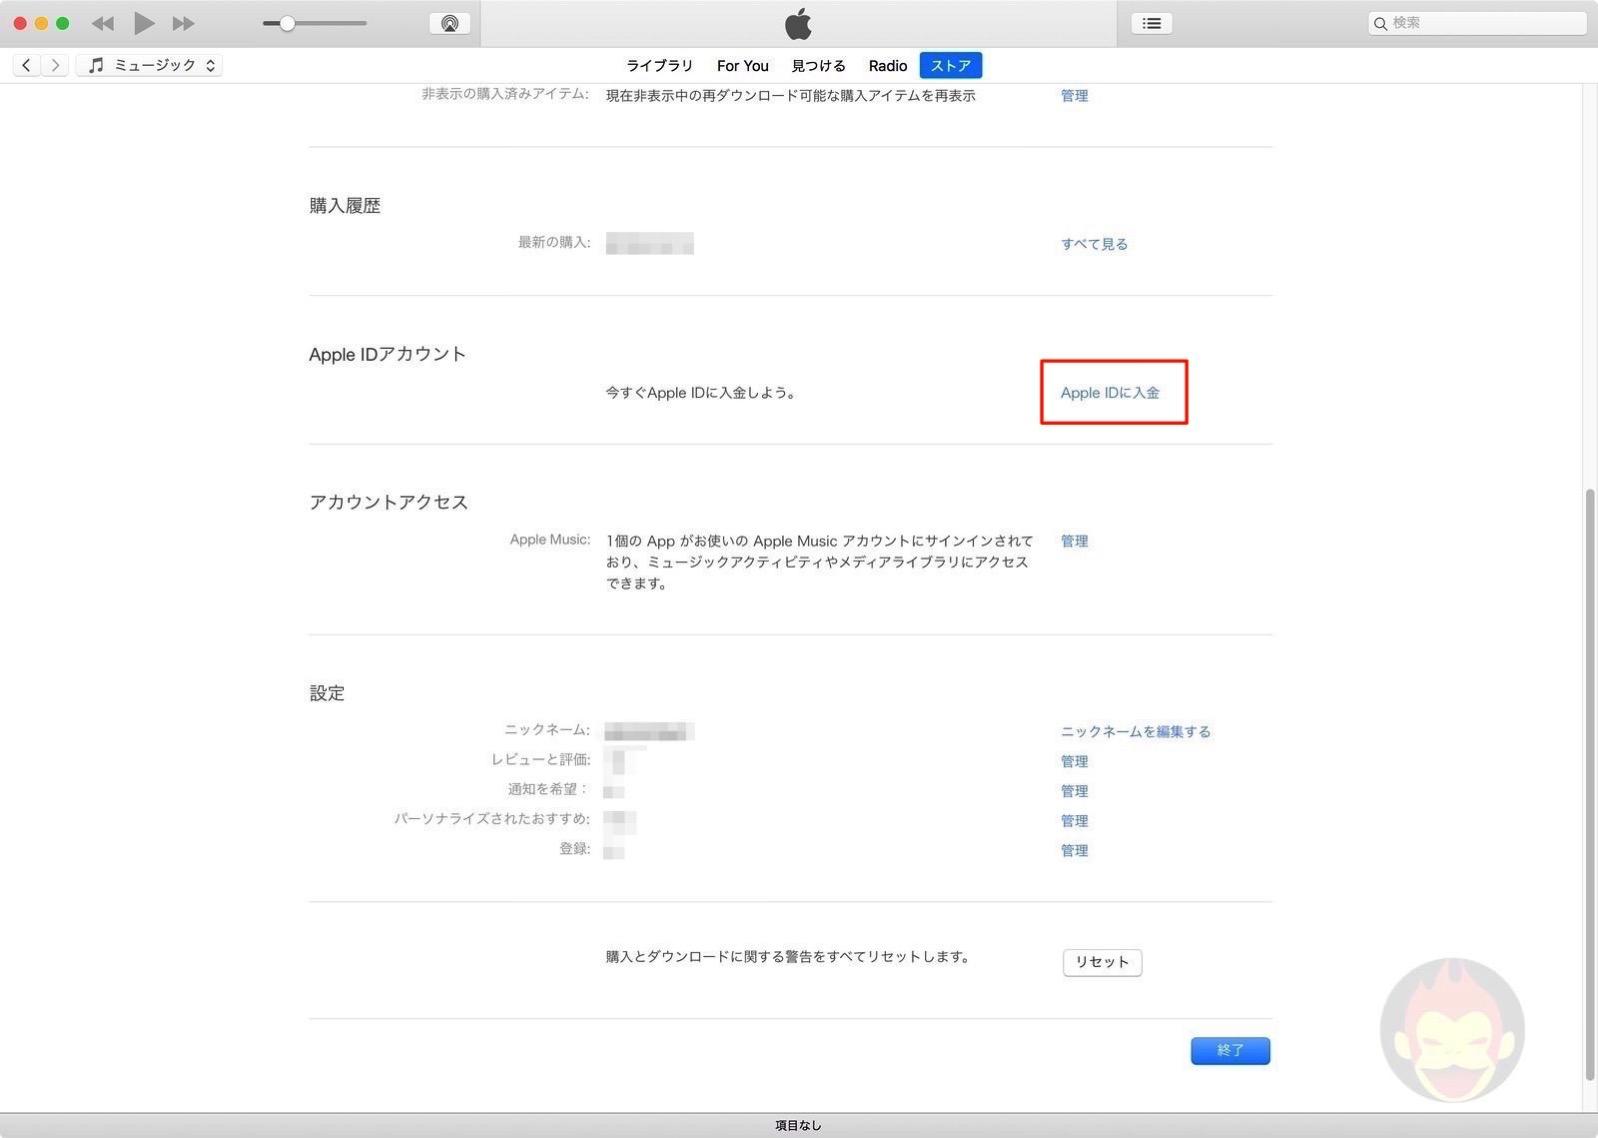 Charging-apple-id-on-mac-01-2-2.jpg